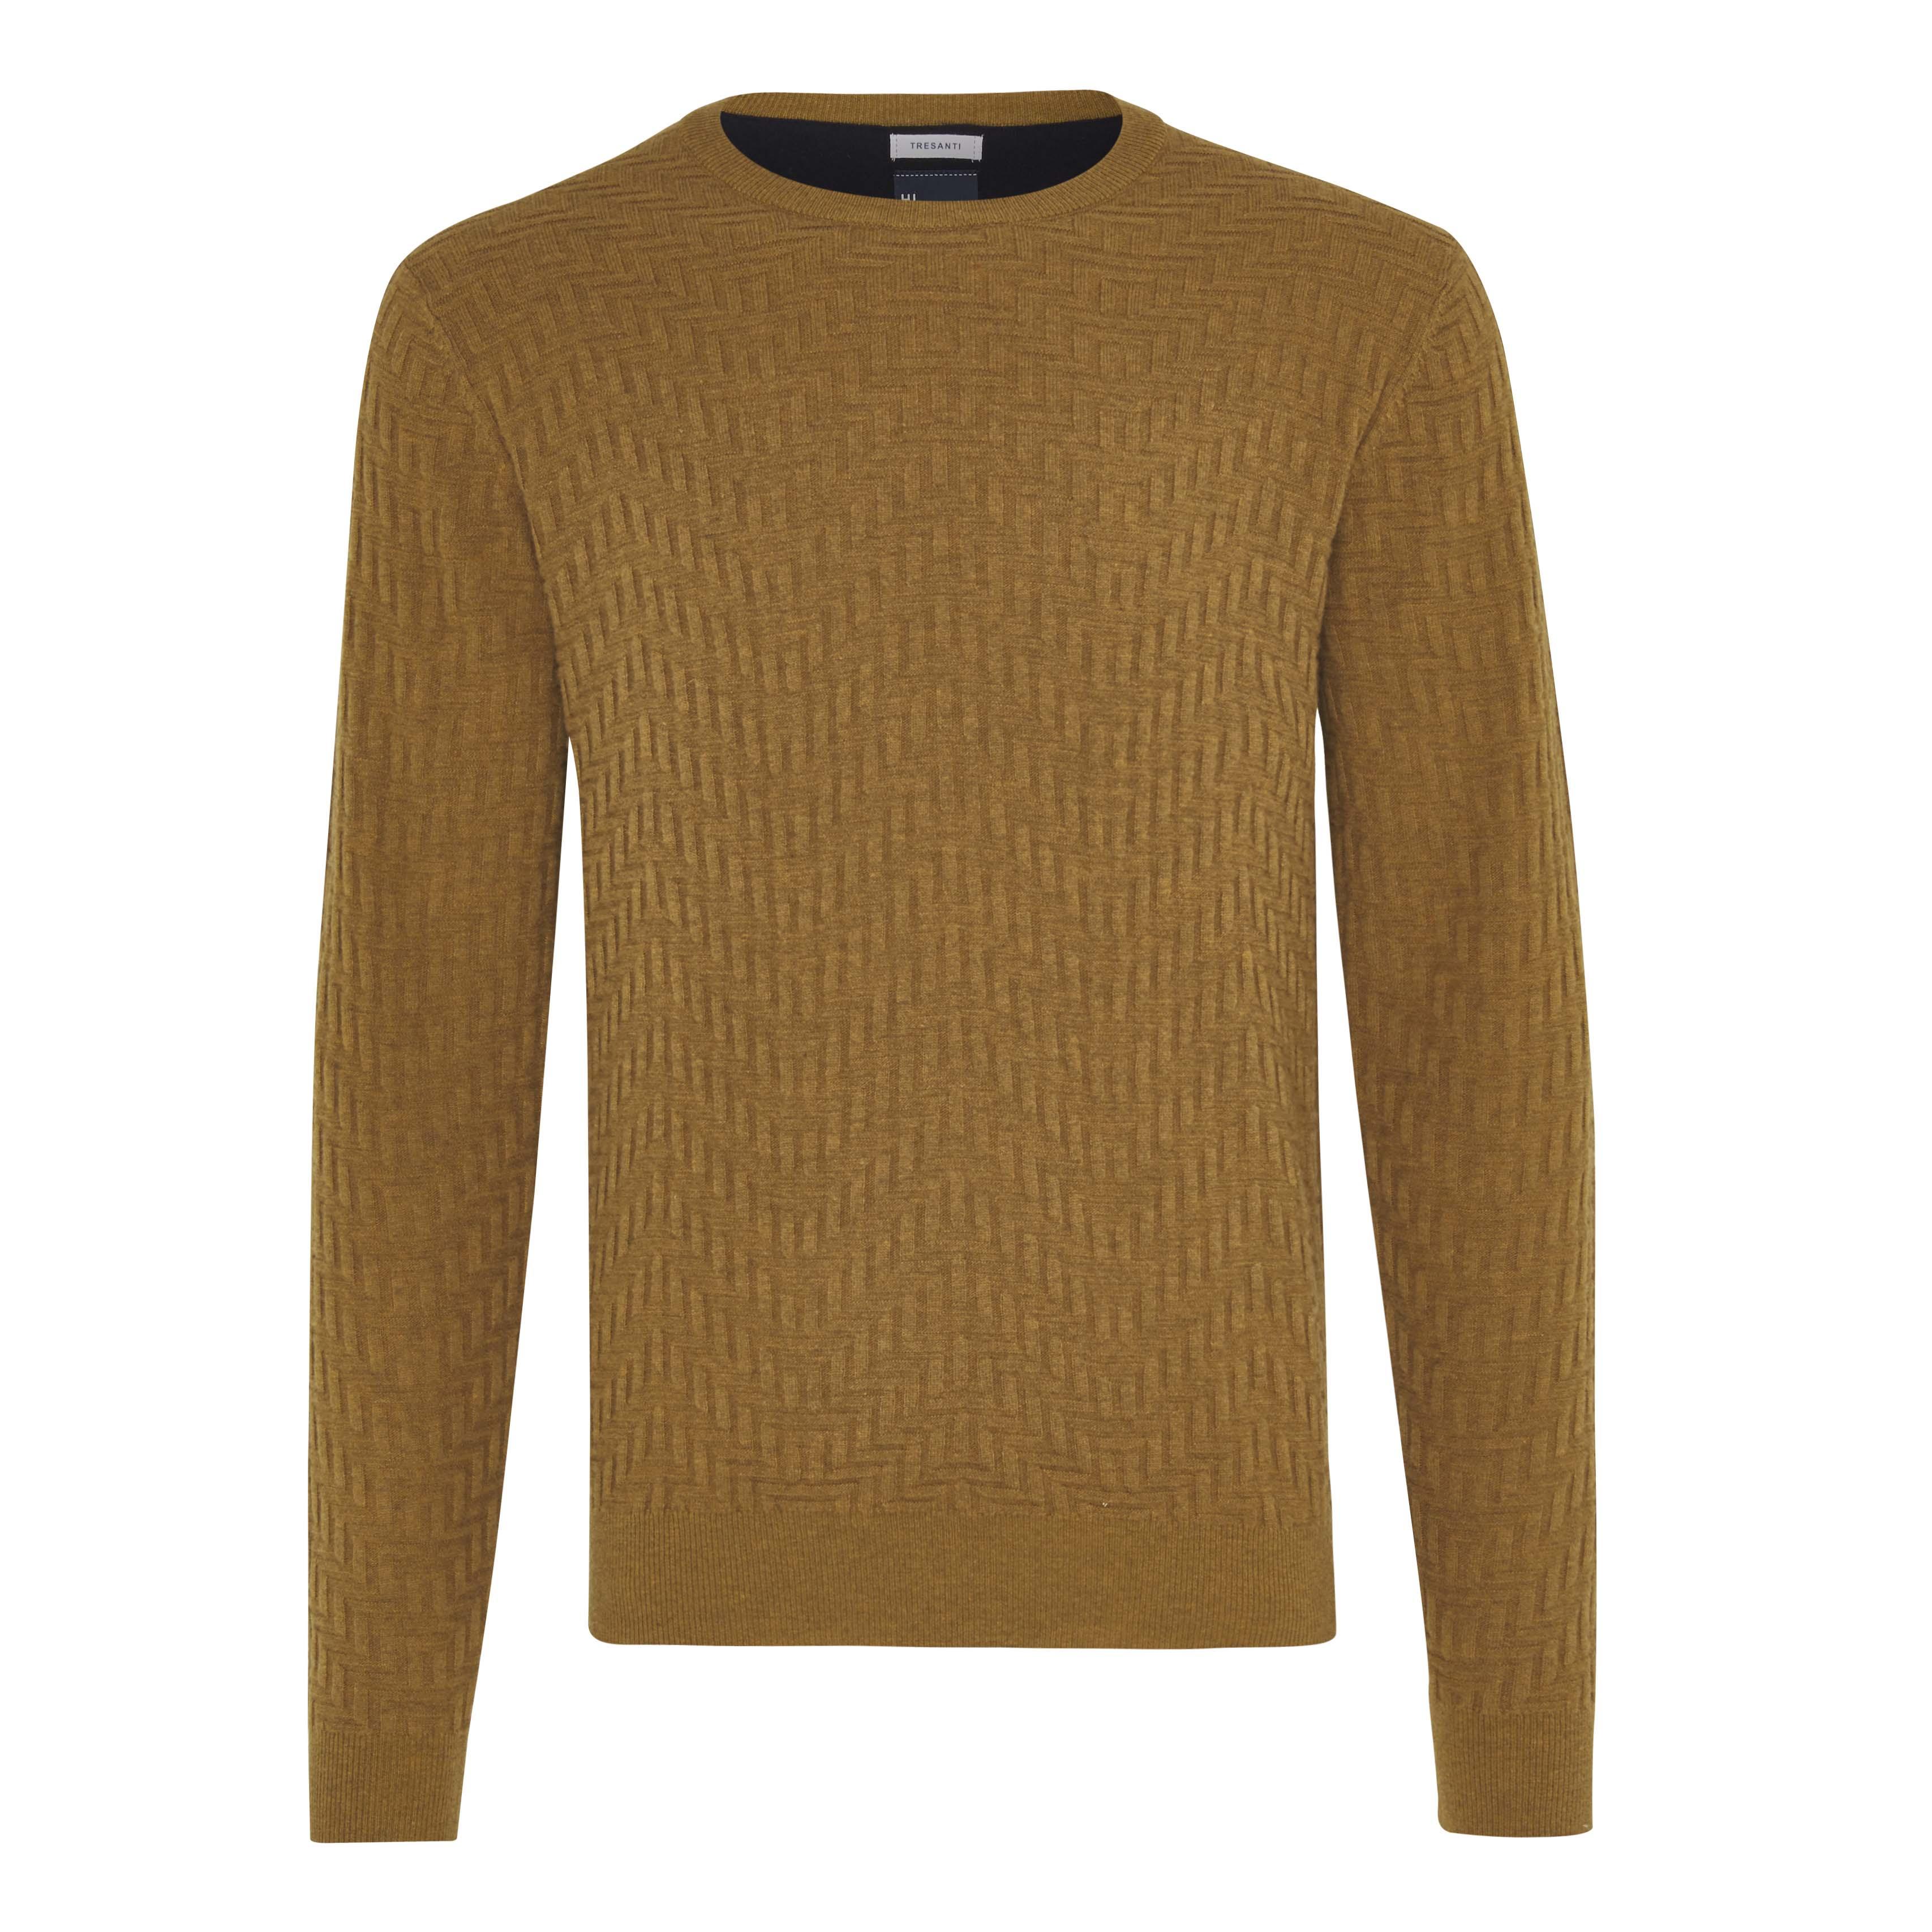 Jax | Pullover zigzag ocher yellow